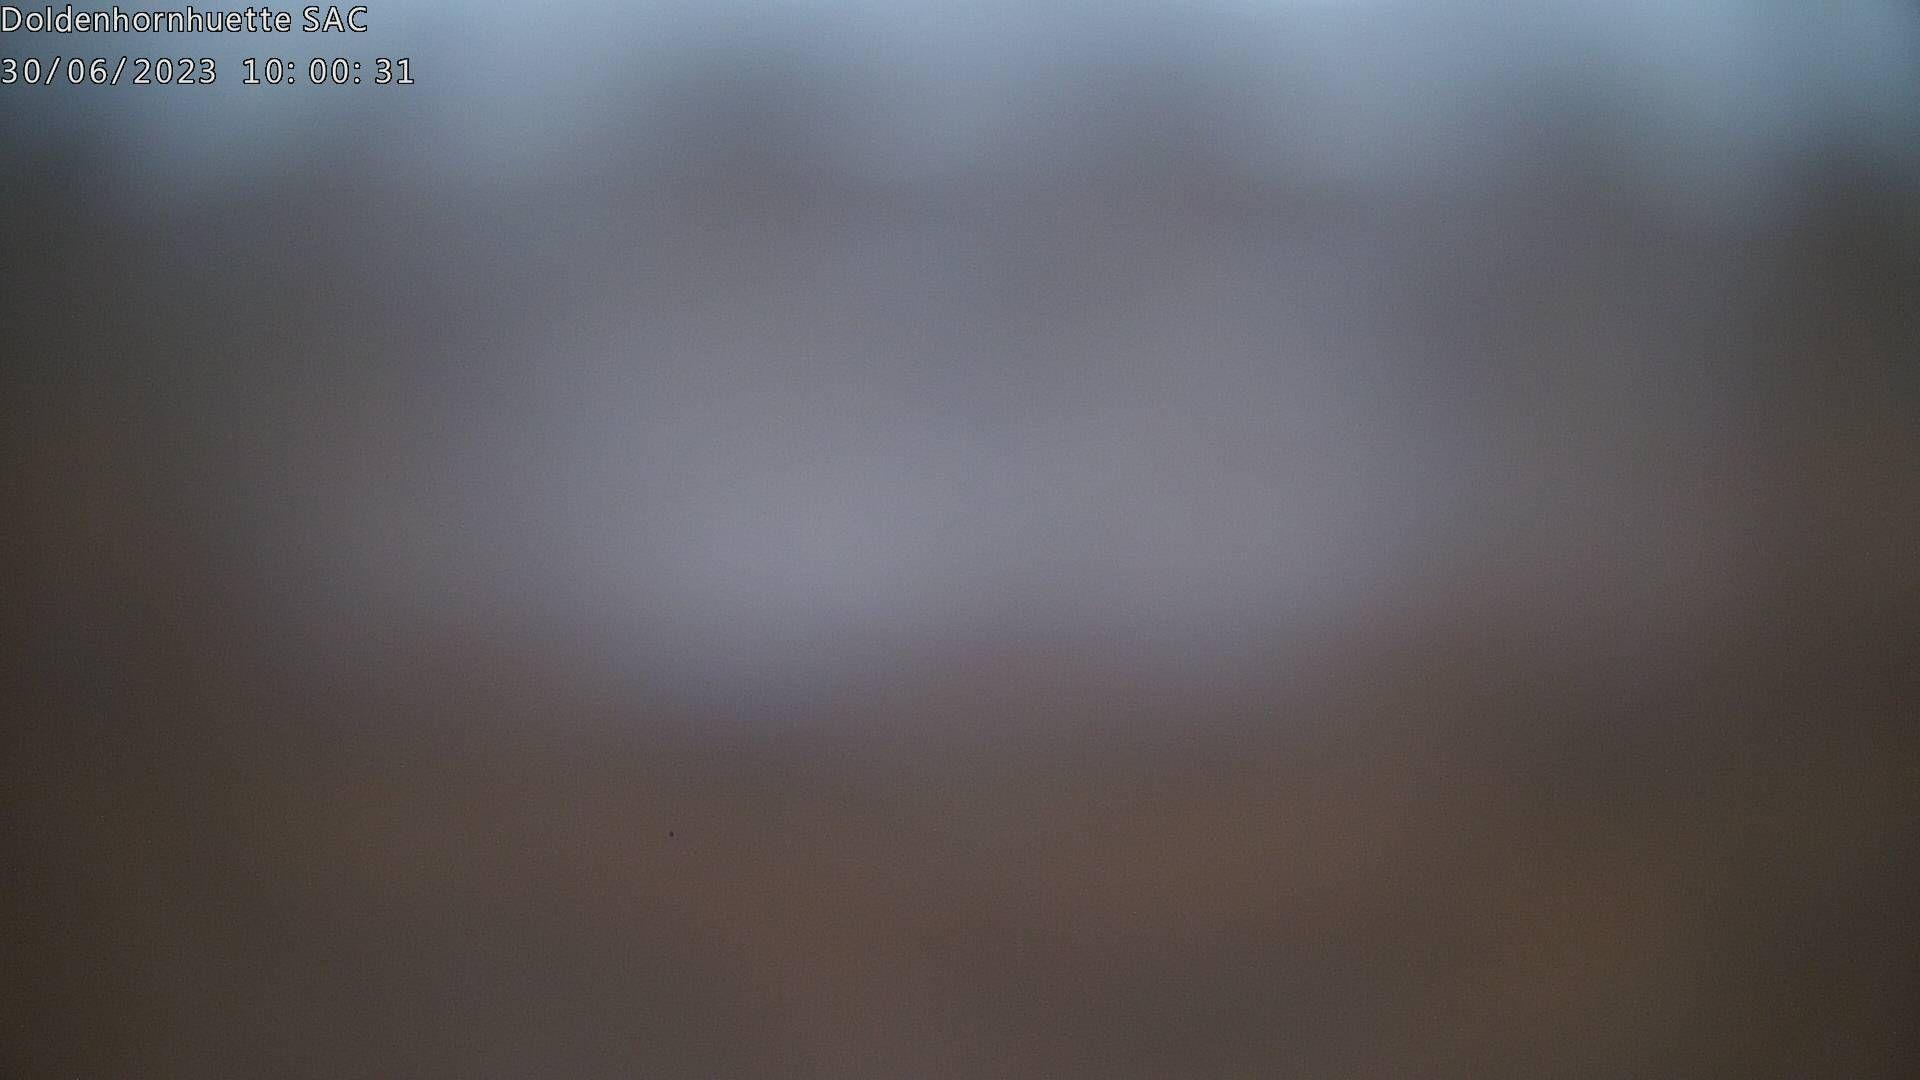 Kandersteg › Ost: Doldenhornhütte